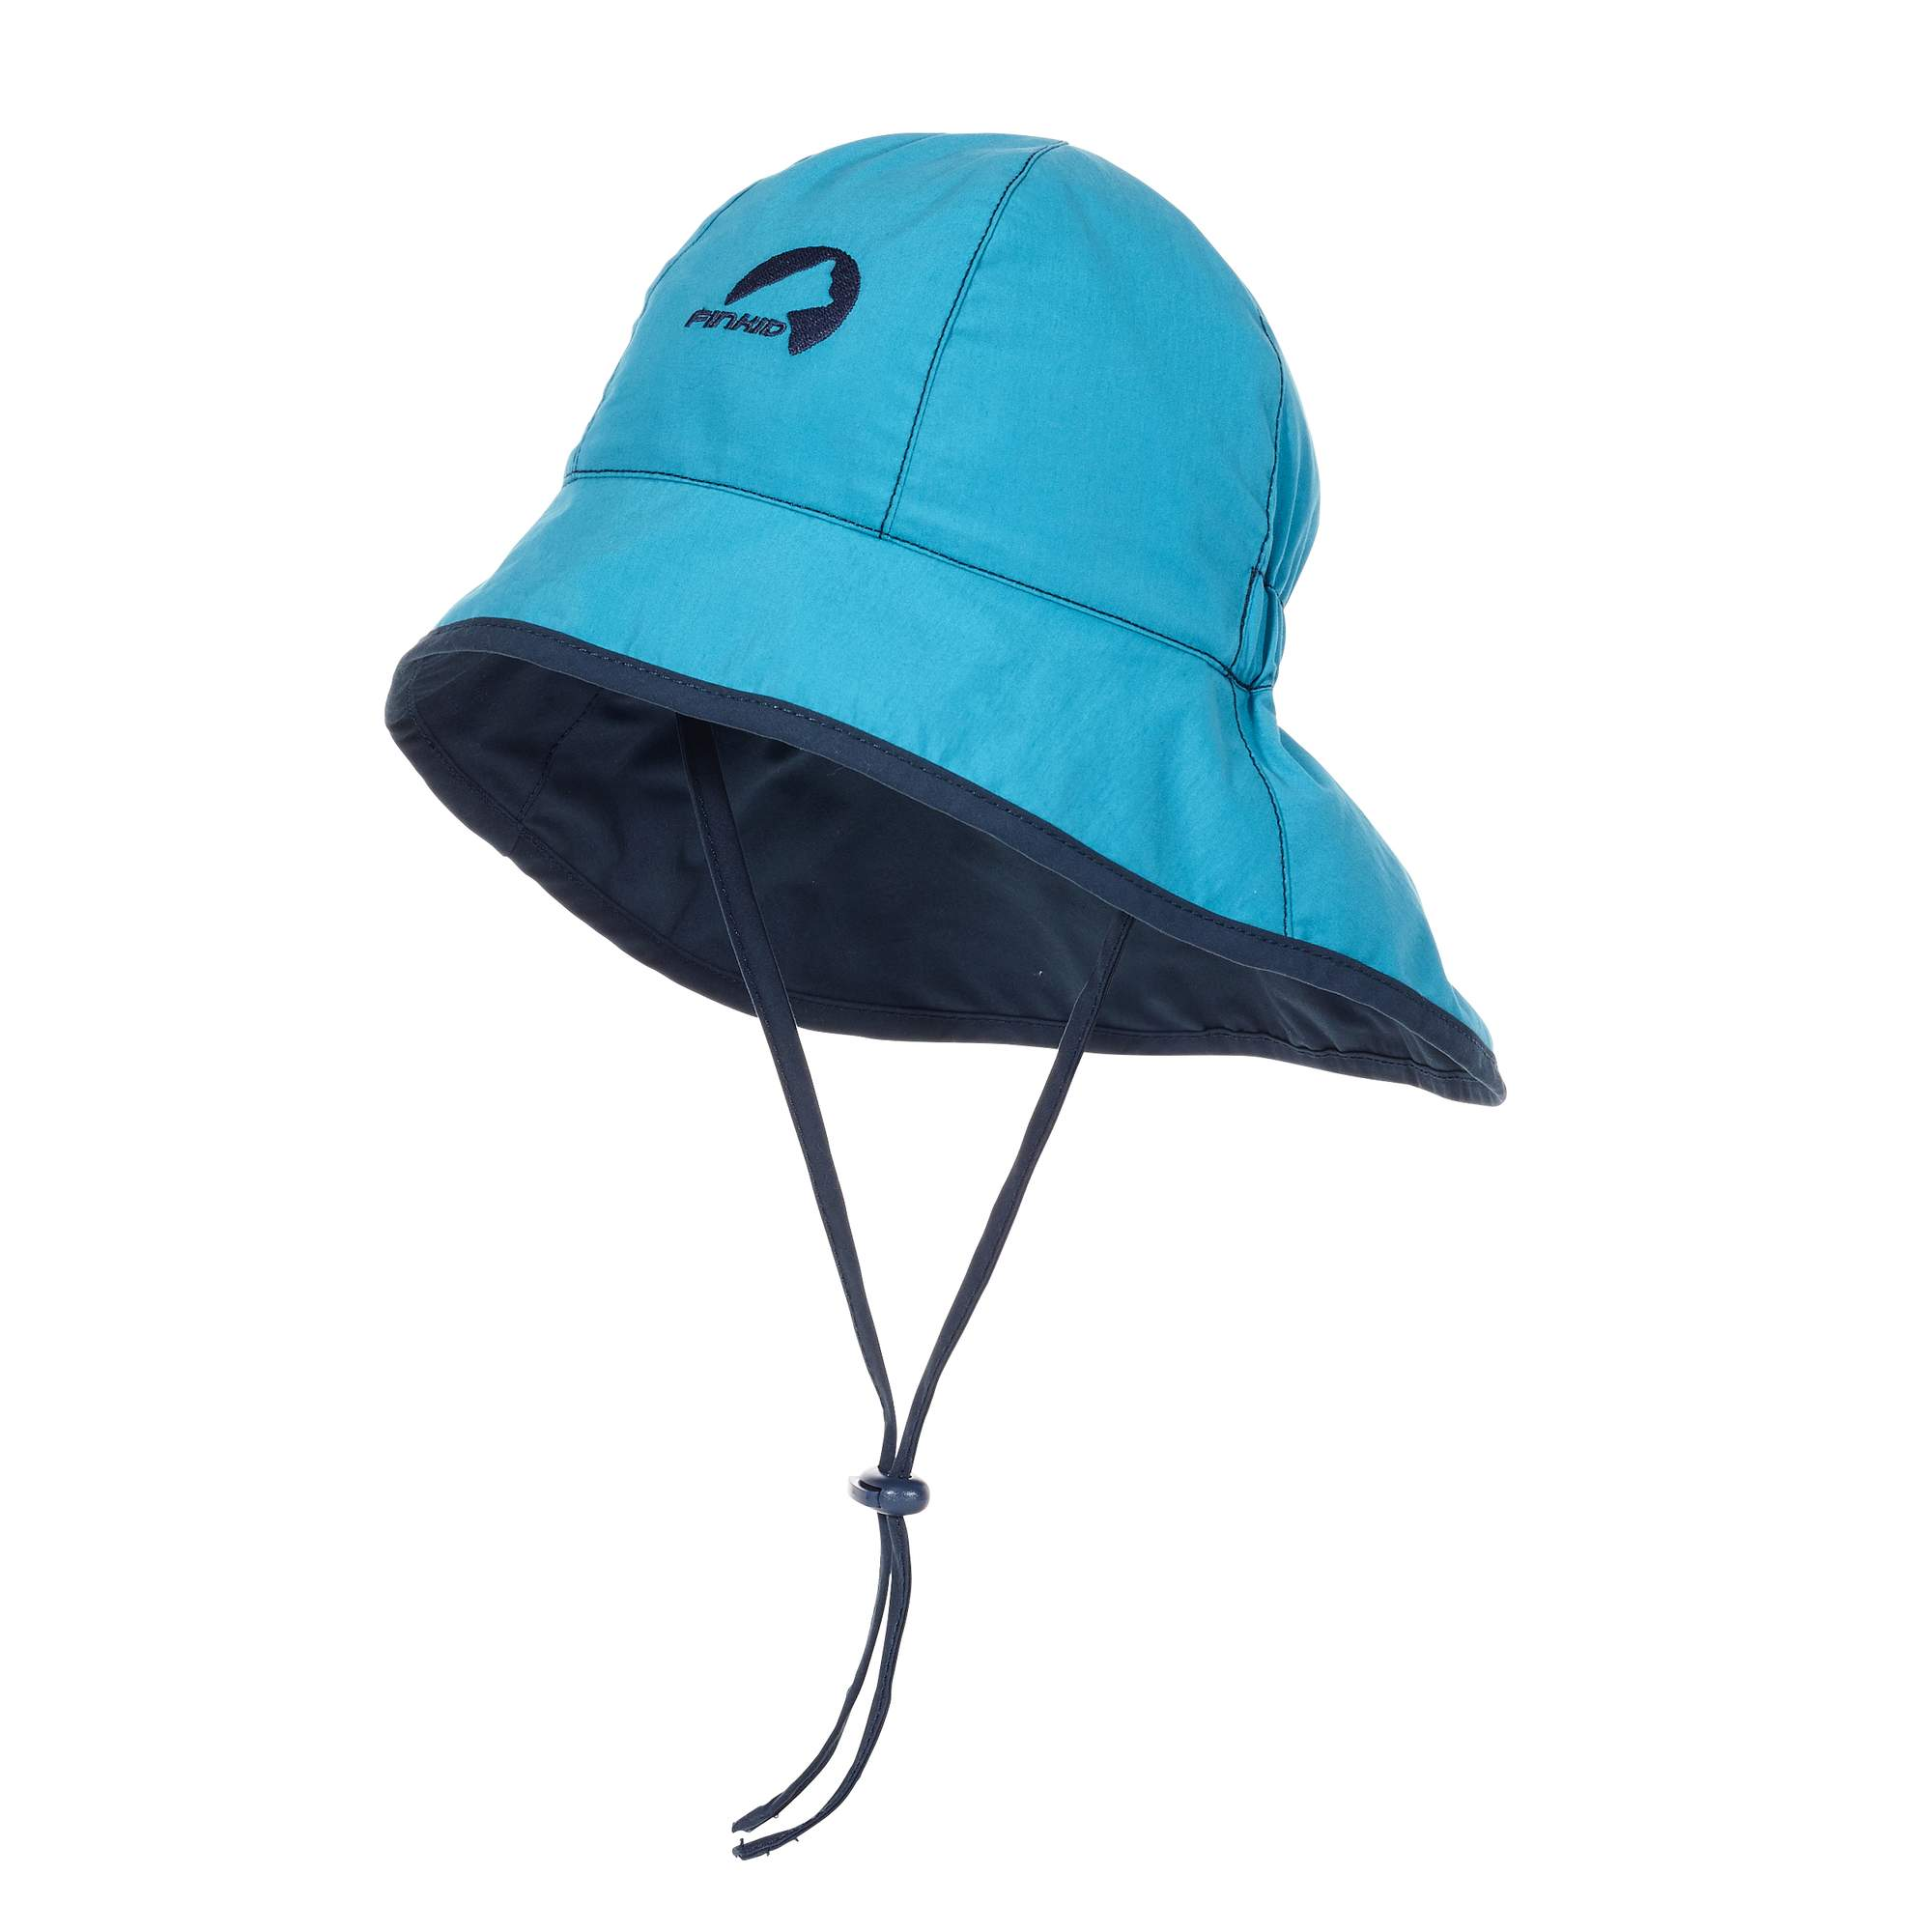 Finkid Ranta Sport Kinder Gr. 44 cm - blau / mosaic/navy - Hüte 6031099